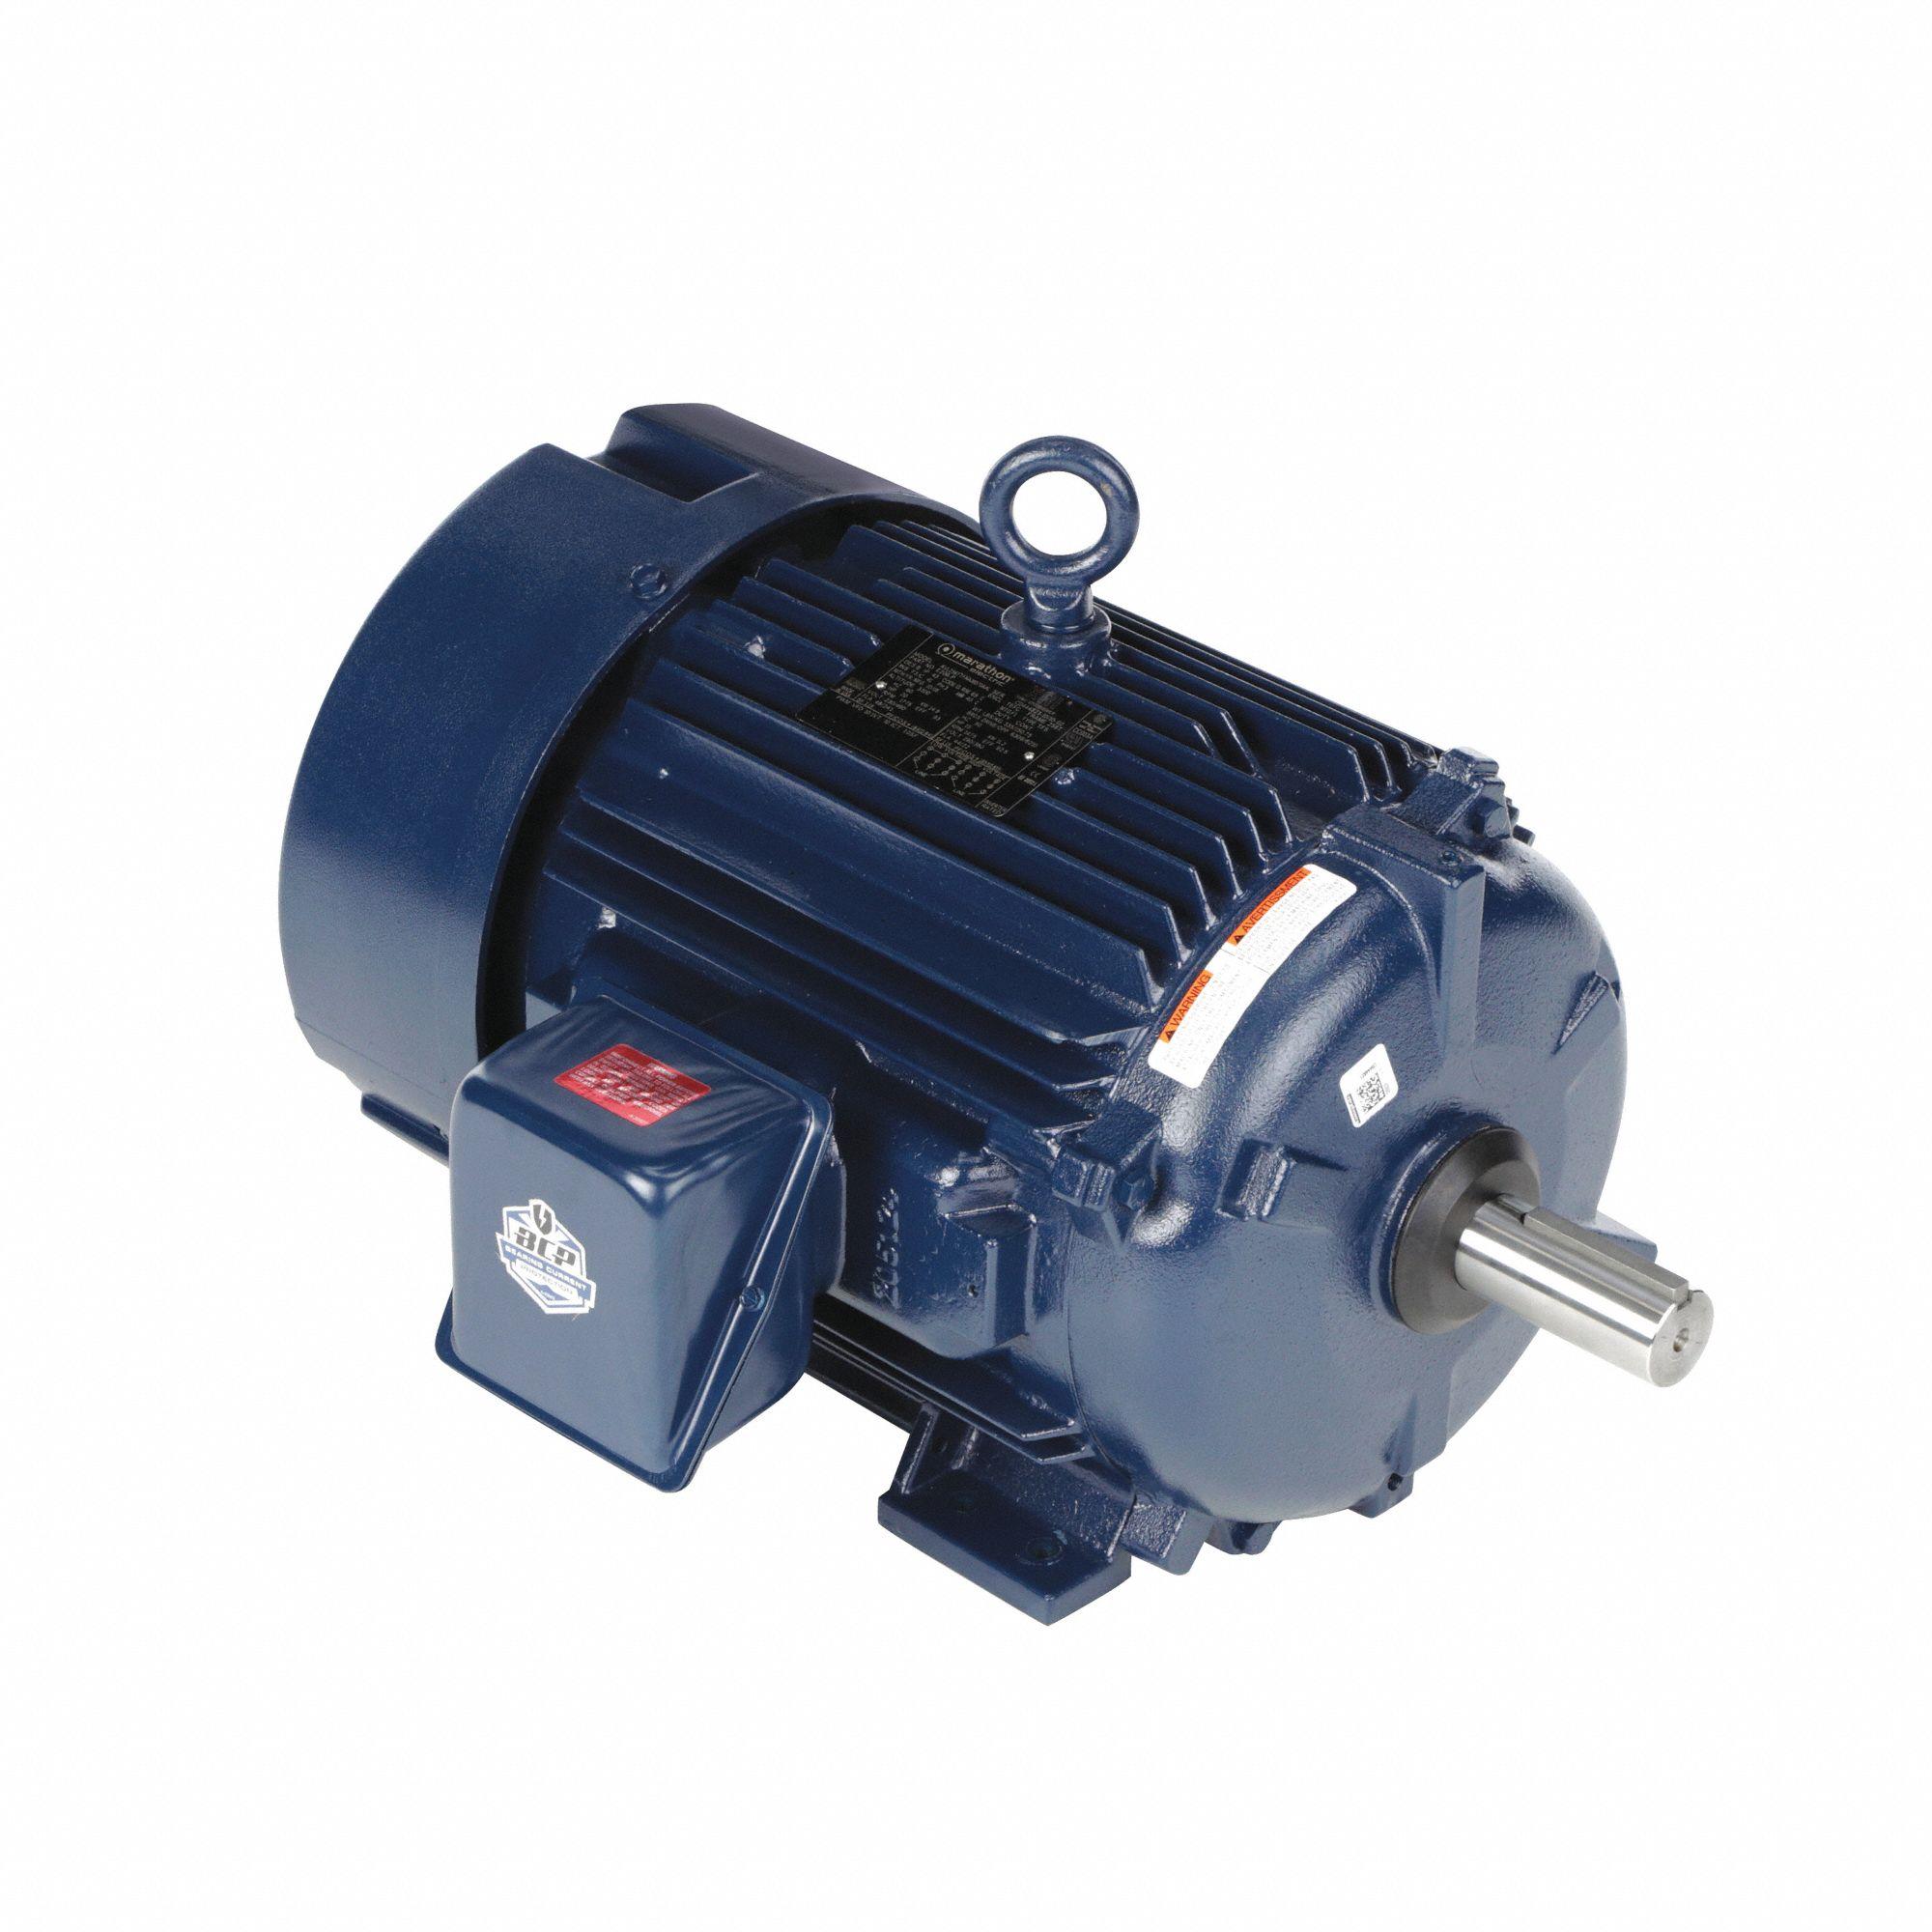 hight resolution of marathon motors 20 hp general purpose motor 3 phase 1775 nameplate rpm voltage 230 460 frame 256t 40z956 256ttfna16070 grainger